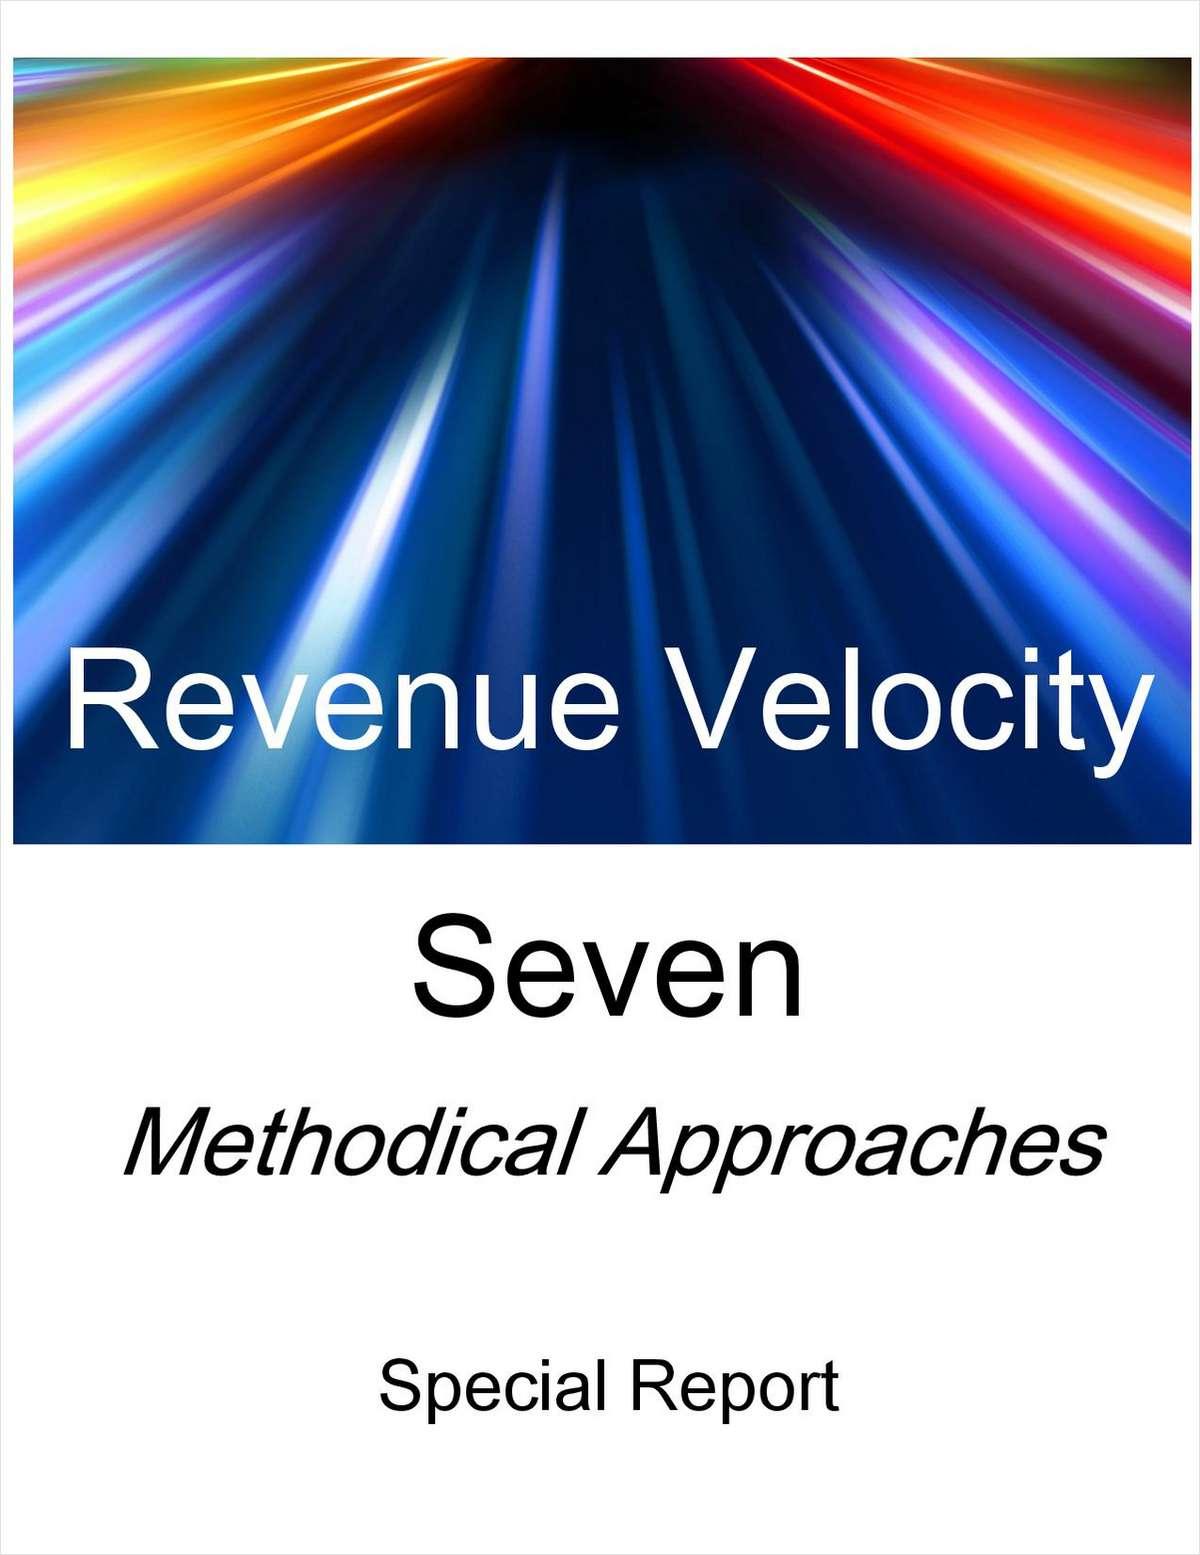 Revenue Velocity: Seven Methodical Approaches